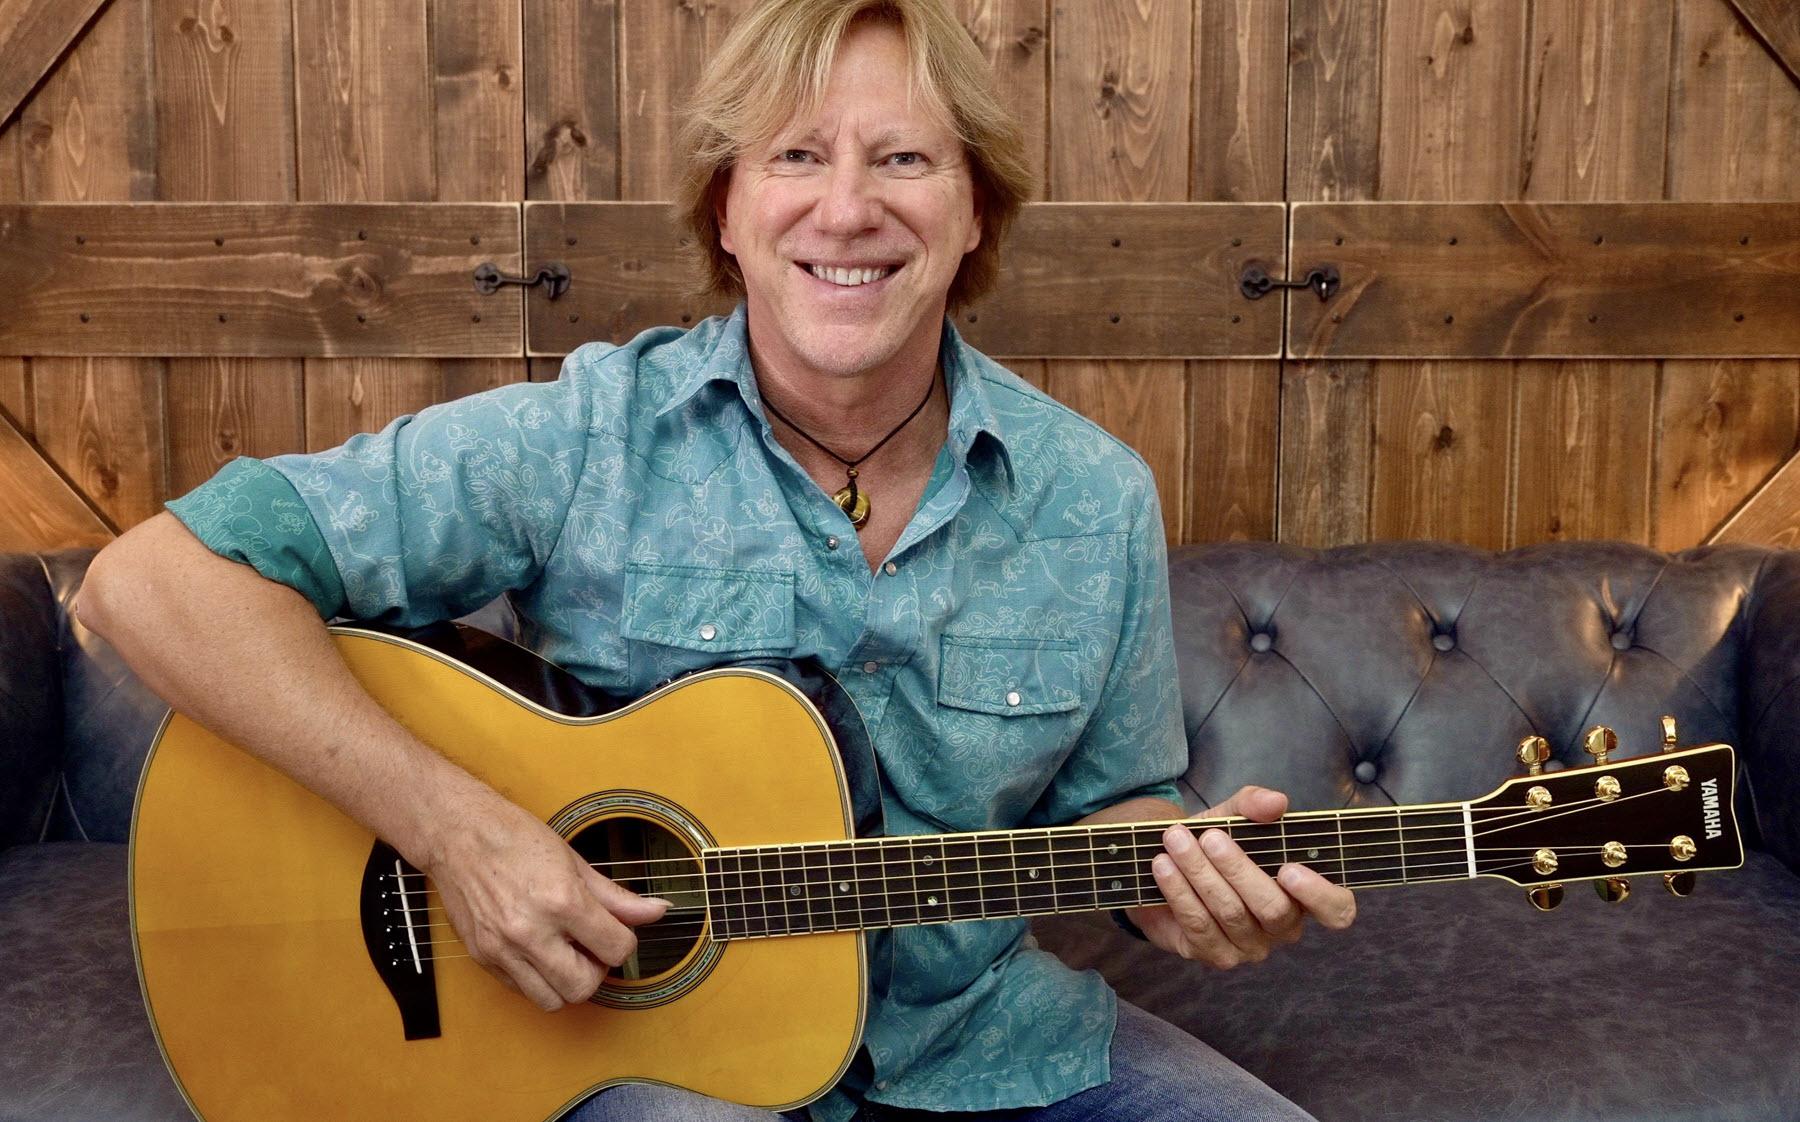 Man smiling and playing guitar.